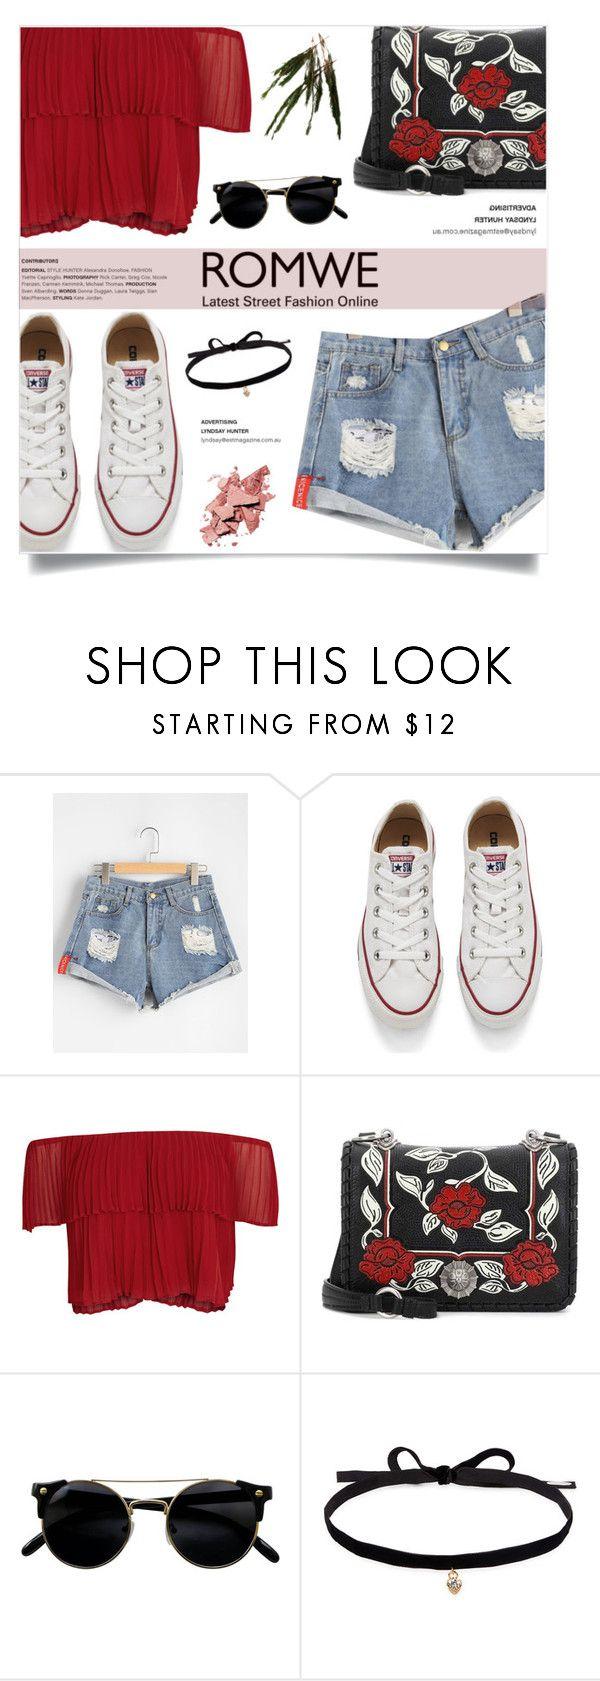 """Romwe - Ripped Denim Shorts"" by fashion-bea-16 ❤ liked on Polyvore featuring Converse, Keepsake the Label, Miu Miu and Joomi Lim"